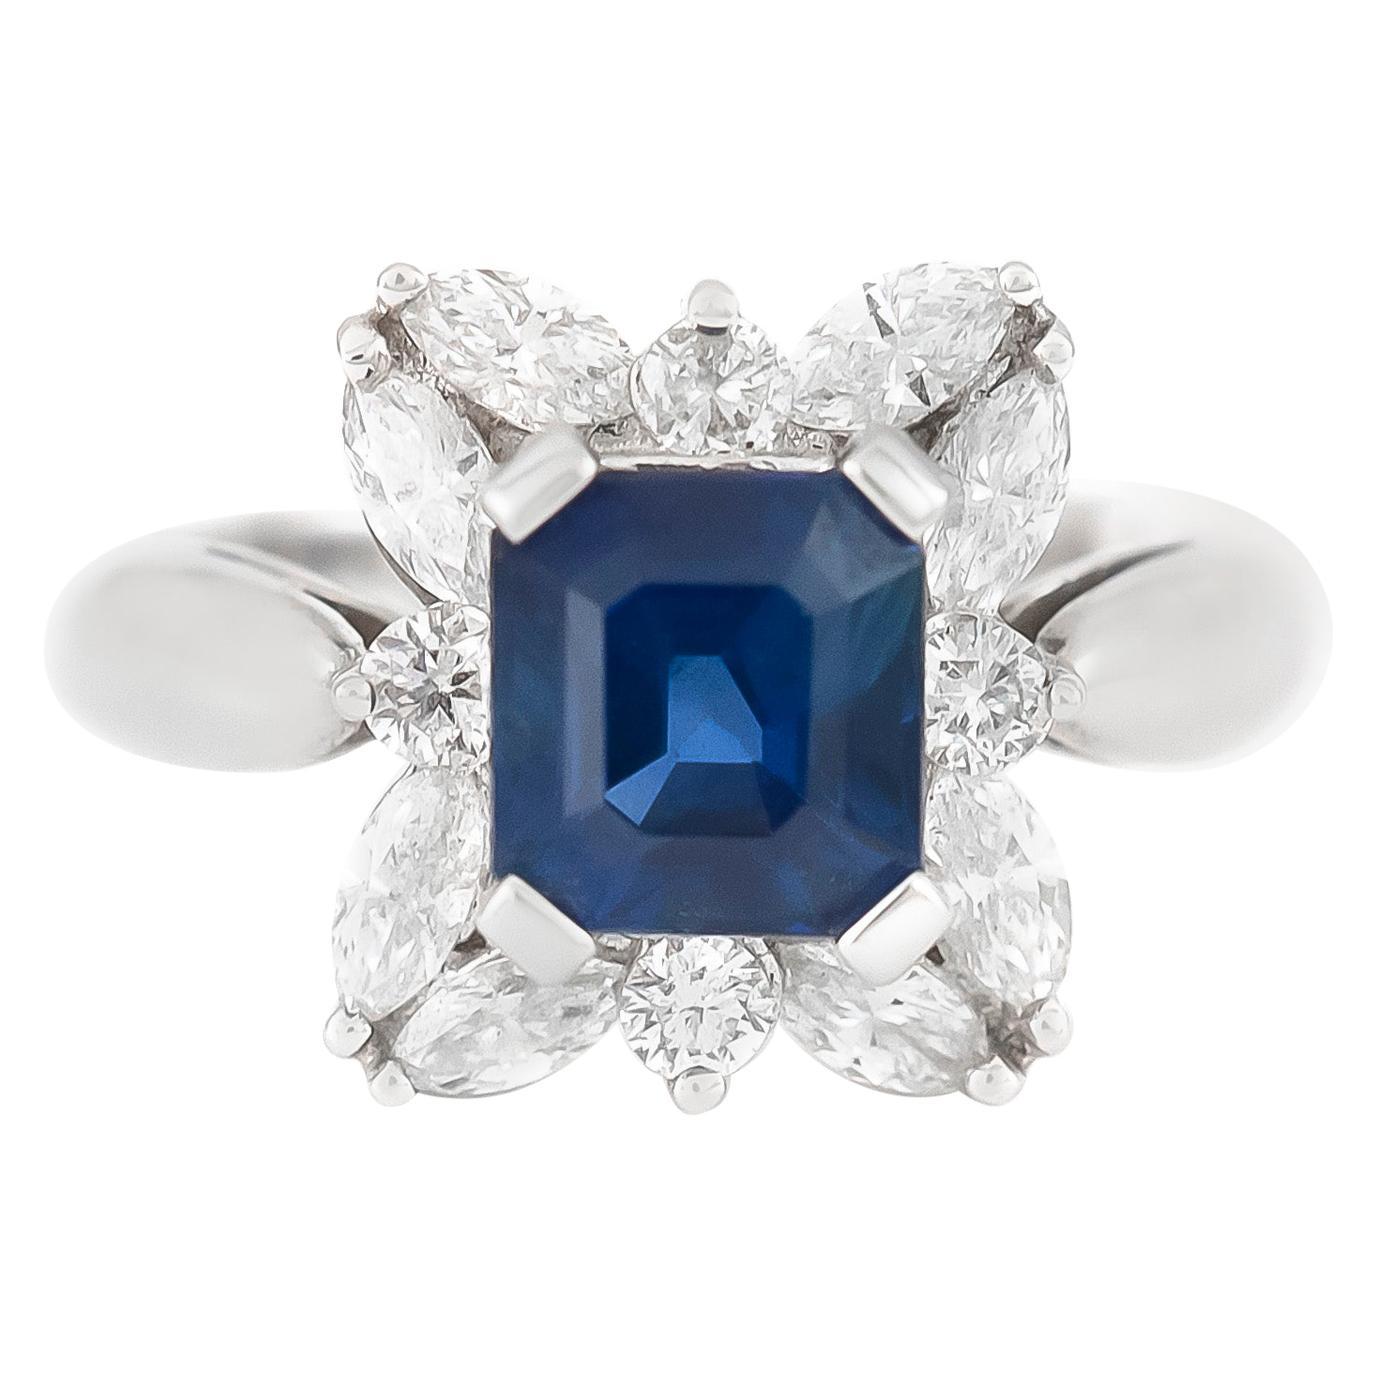 18 Karat White Diamonds Flower Setting with Center Sapphire